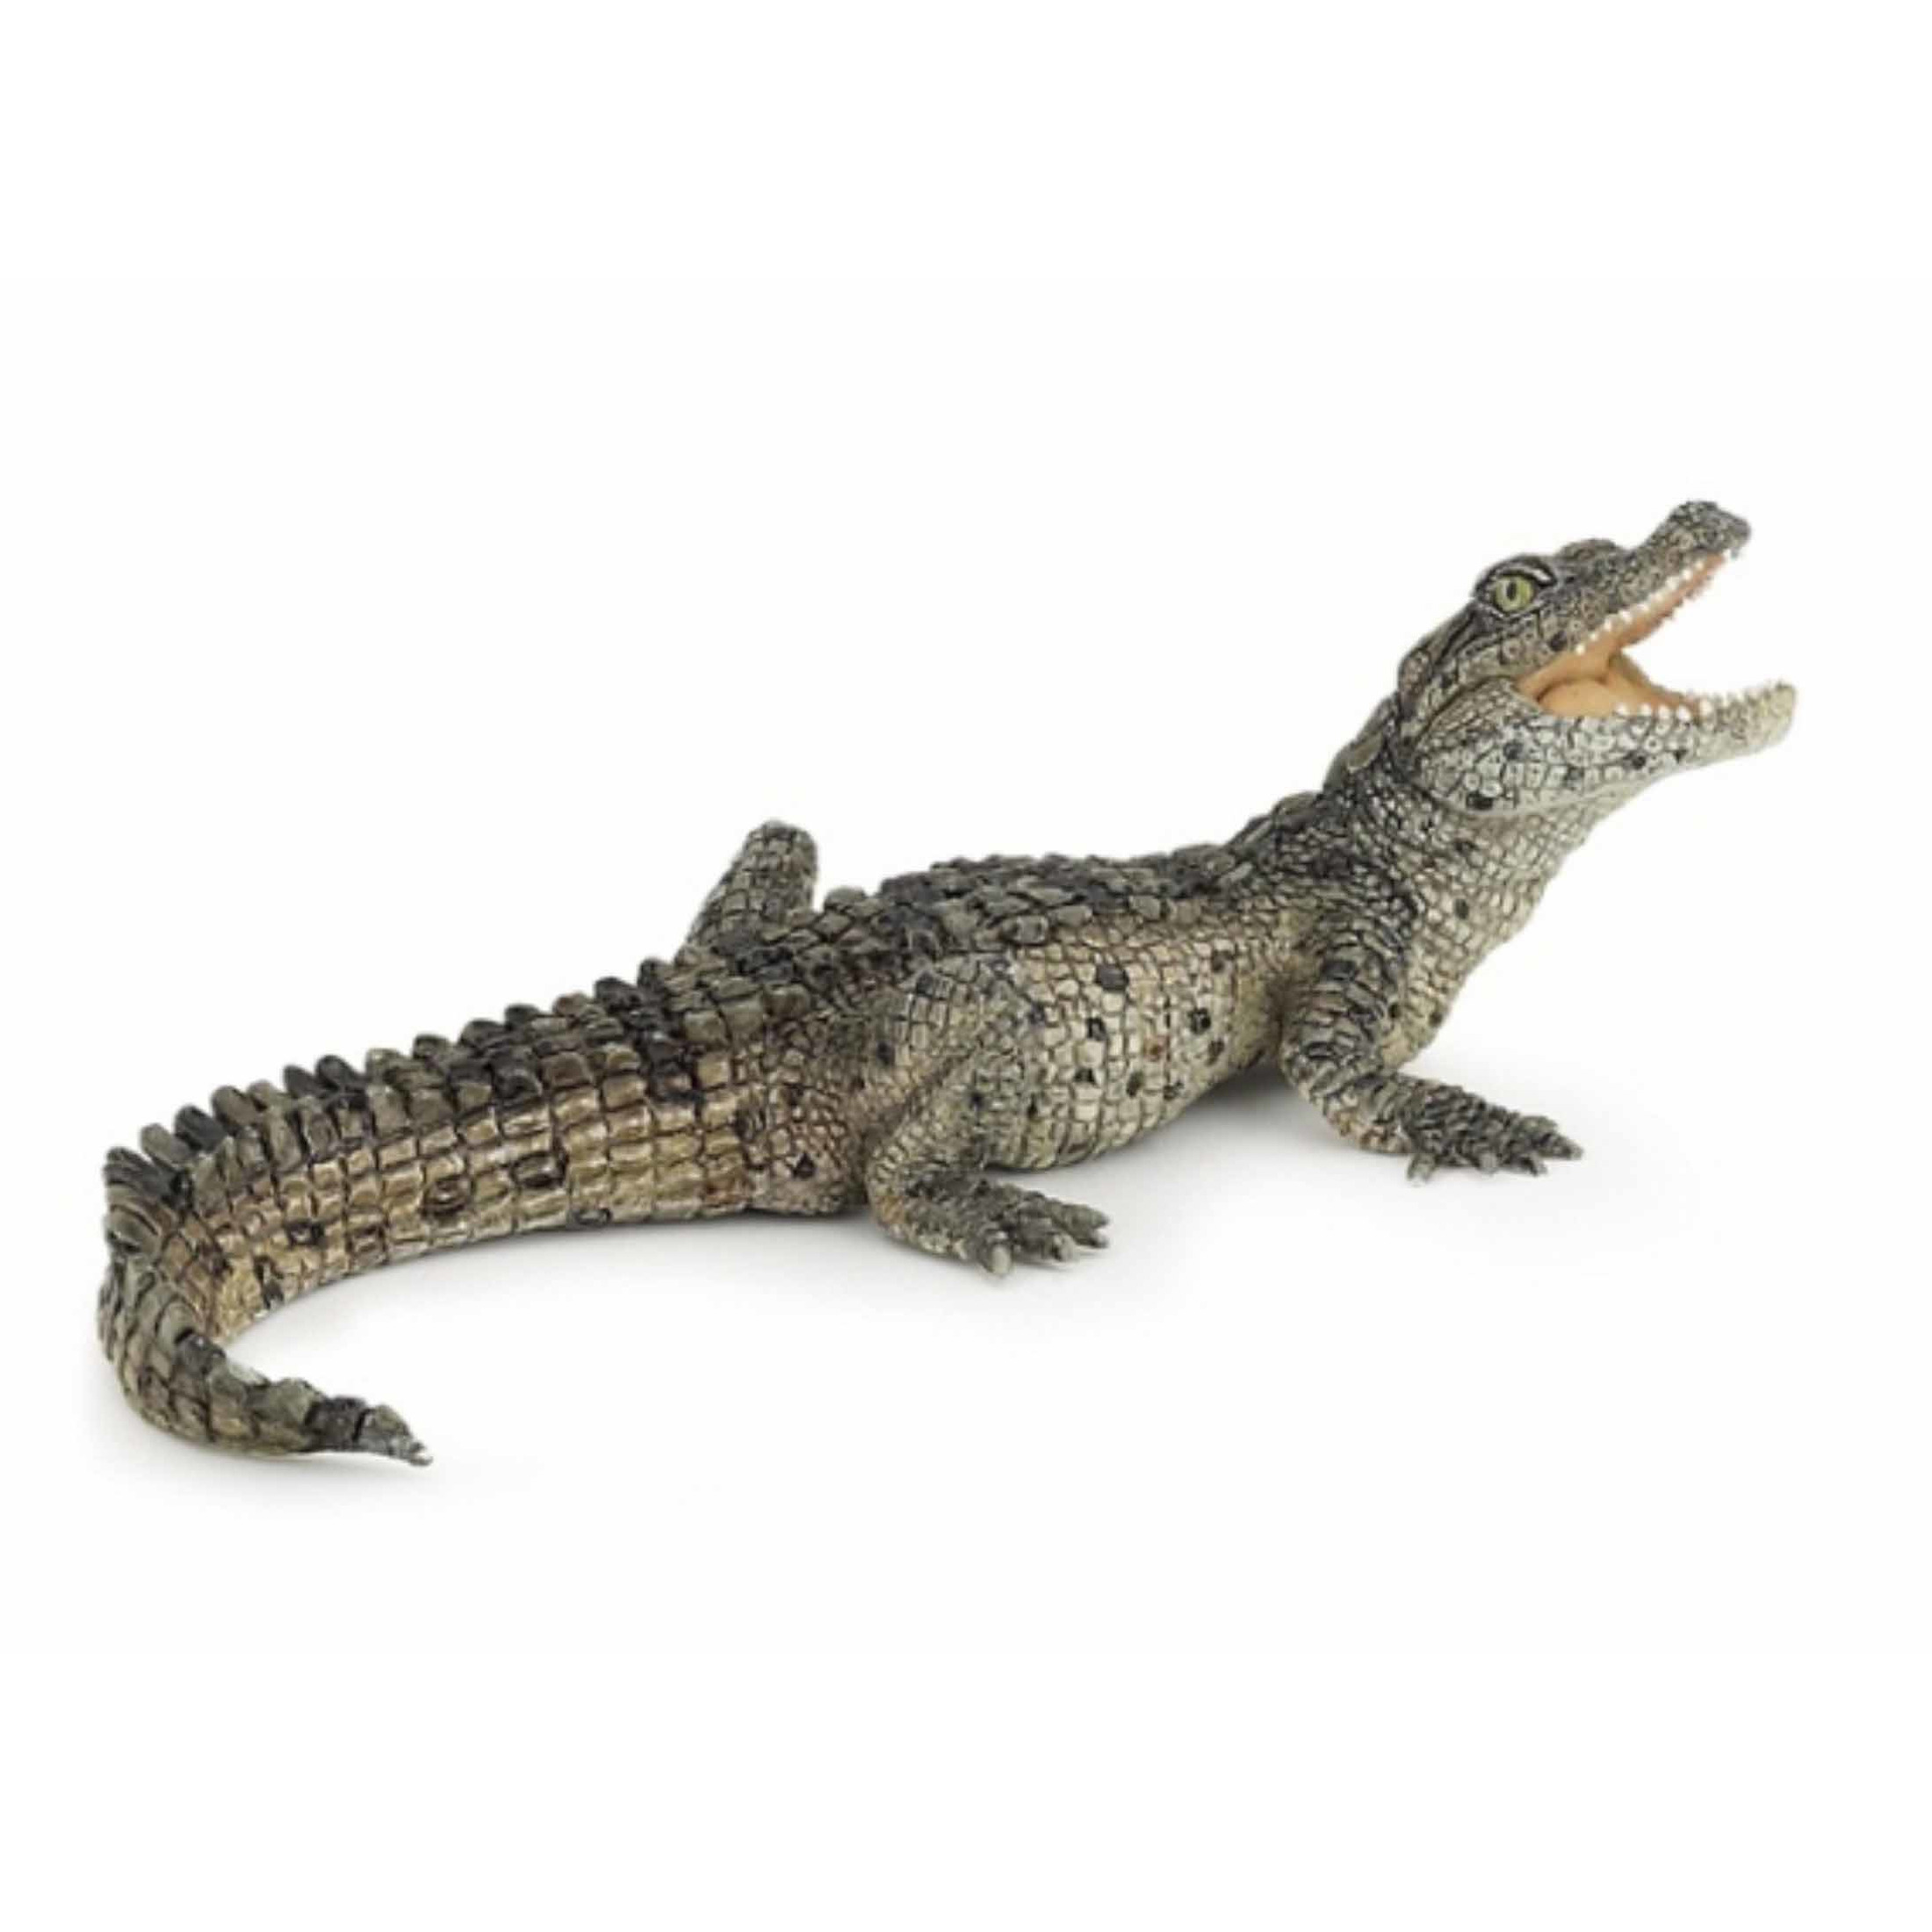 Image of Plastic baby krokodil 10 cm